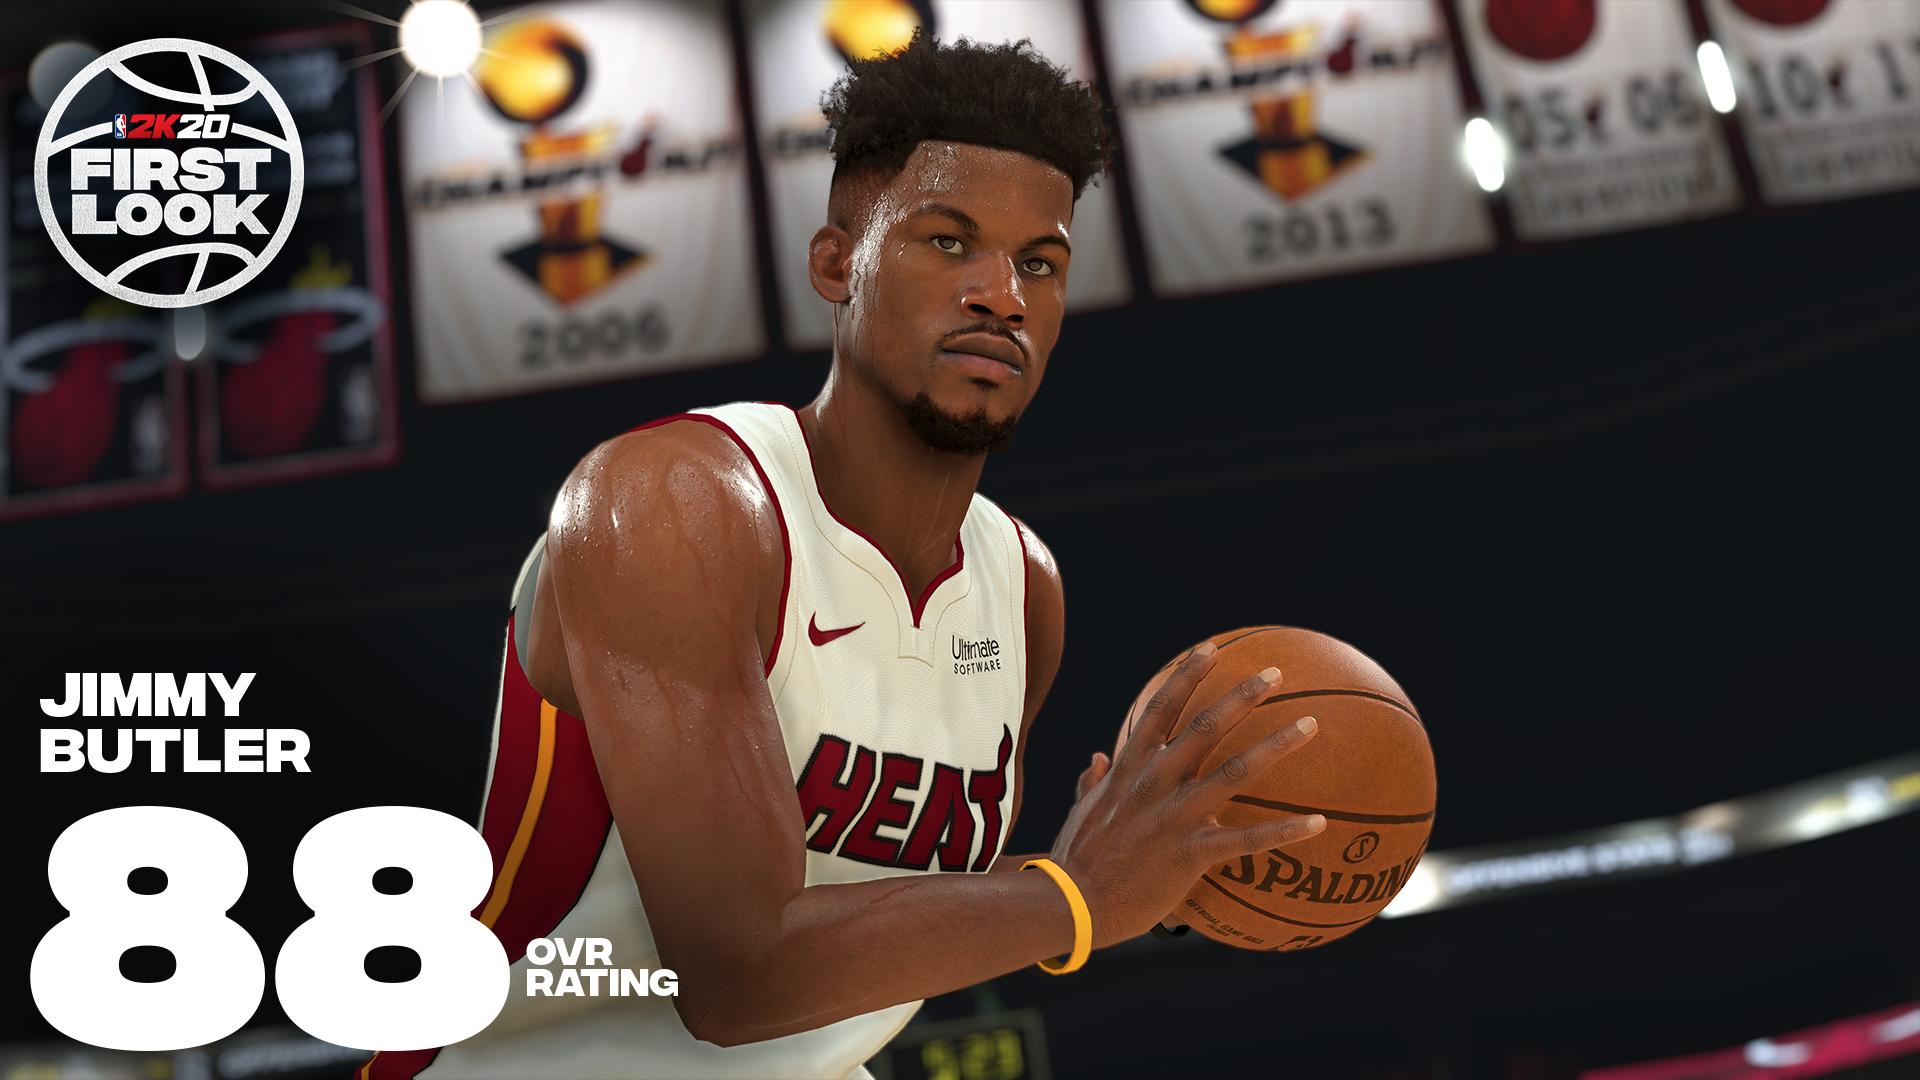 《NBA 2K20》明星球员评分公布!老詹连续10年评分最高 第17张